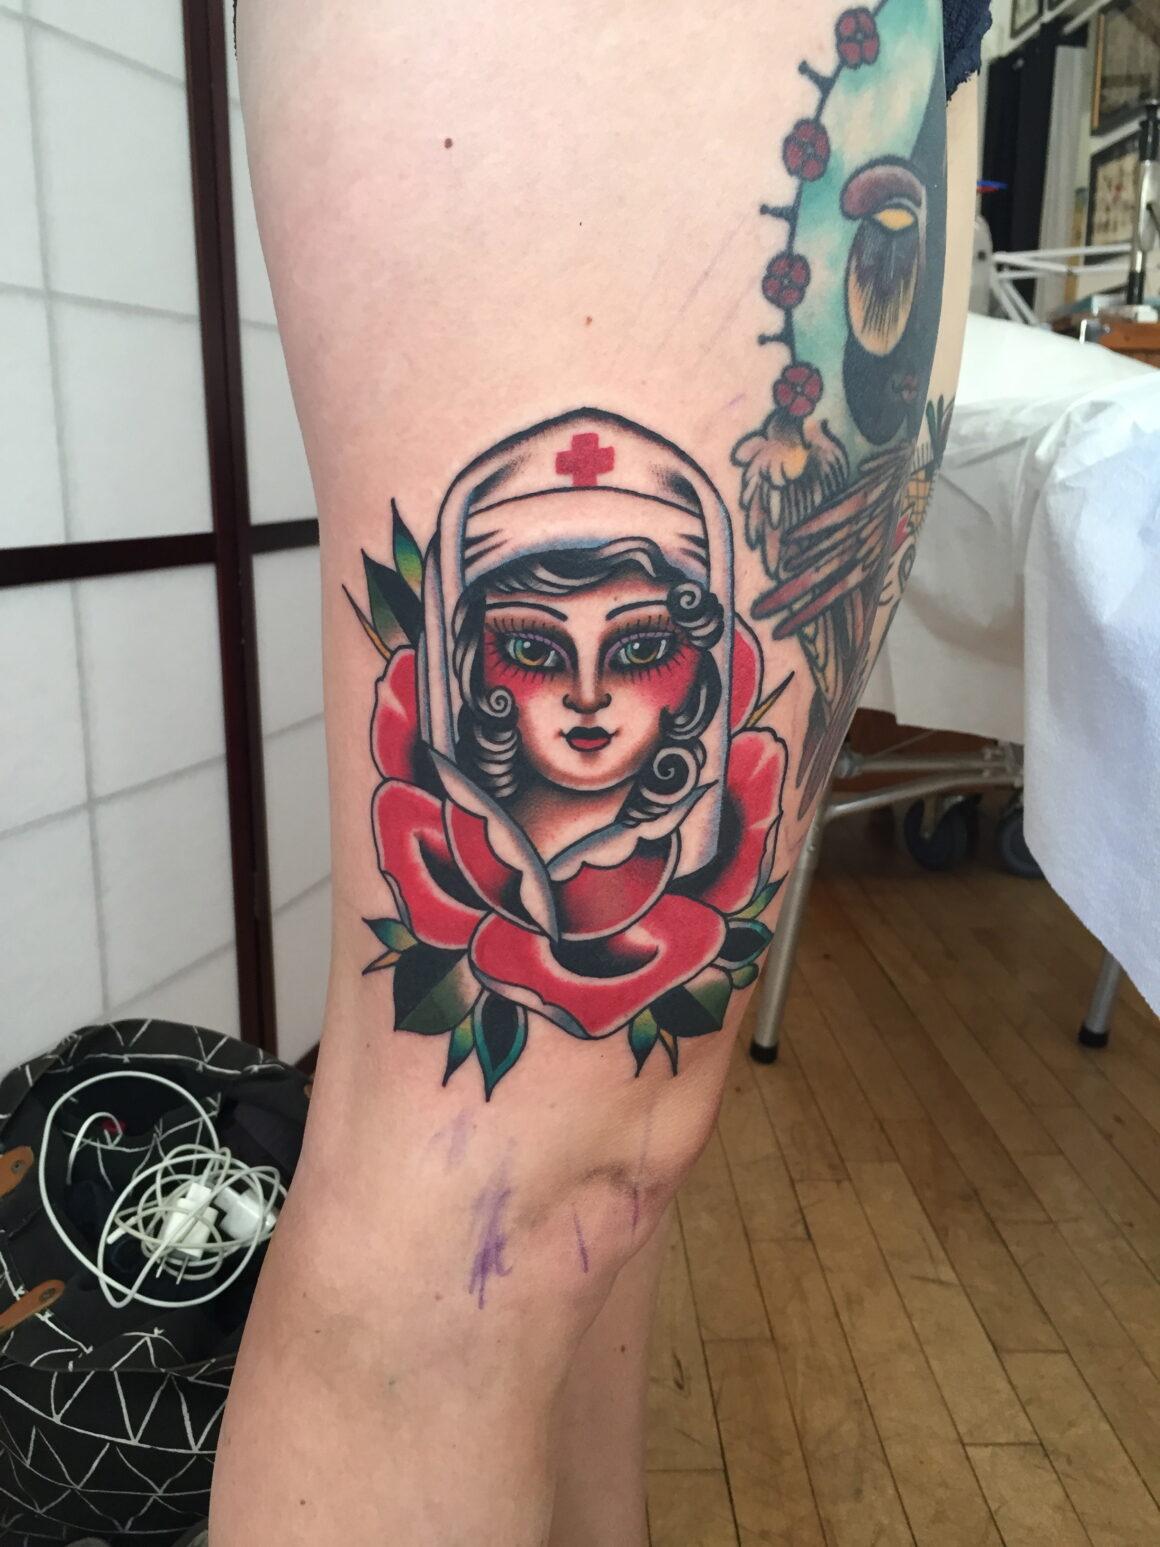 Kim-Ahn Nguyen, Seven Seas Tattoos, Eindhoven, The Netherlands